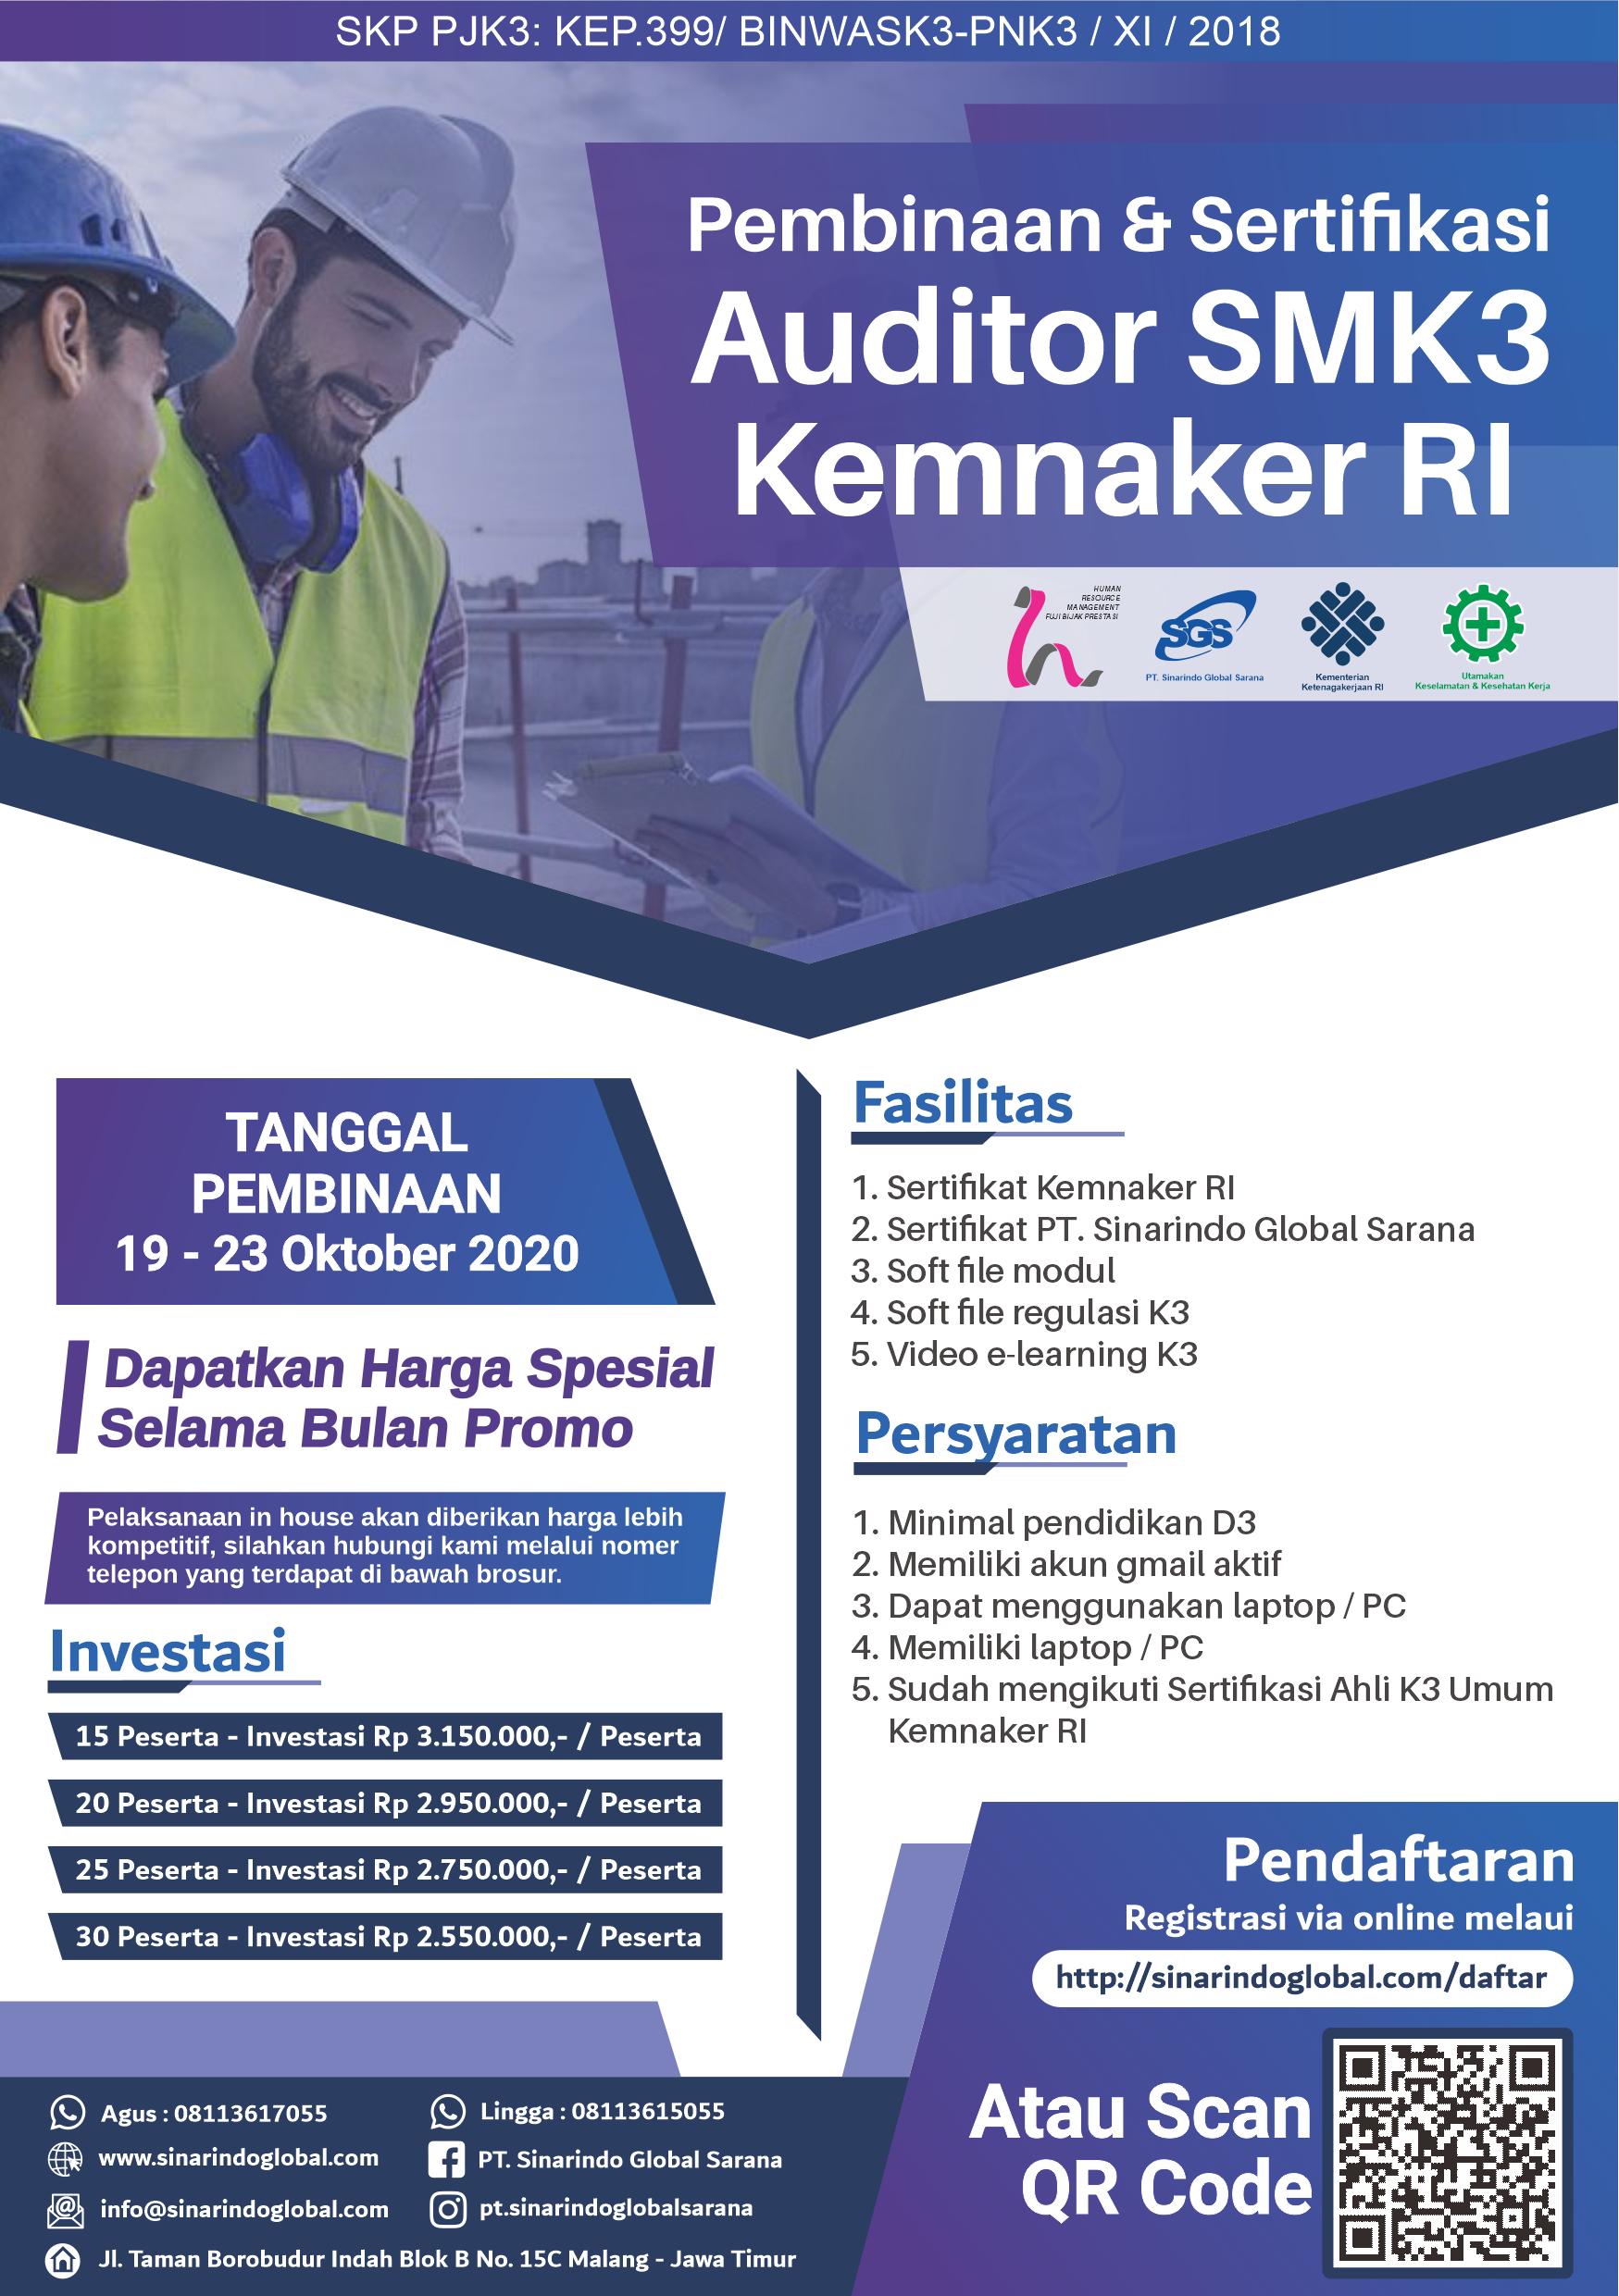 Pembinaan Manajemen Resiko K3 Batch -1 ( 21 - 22 Oktober 2020 )